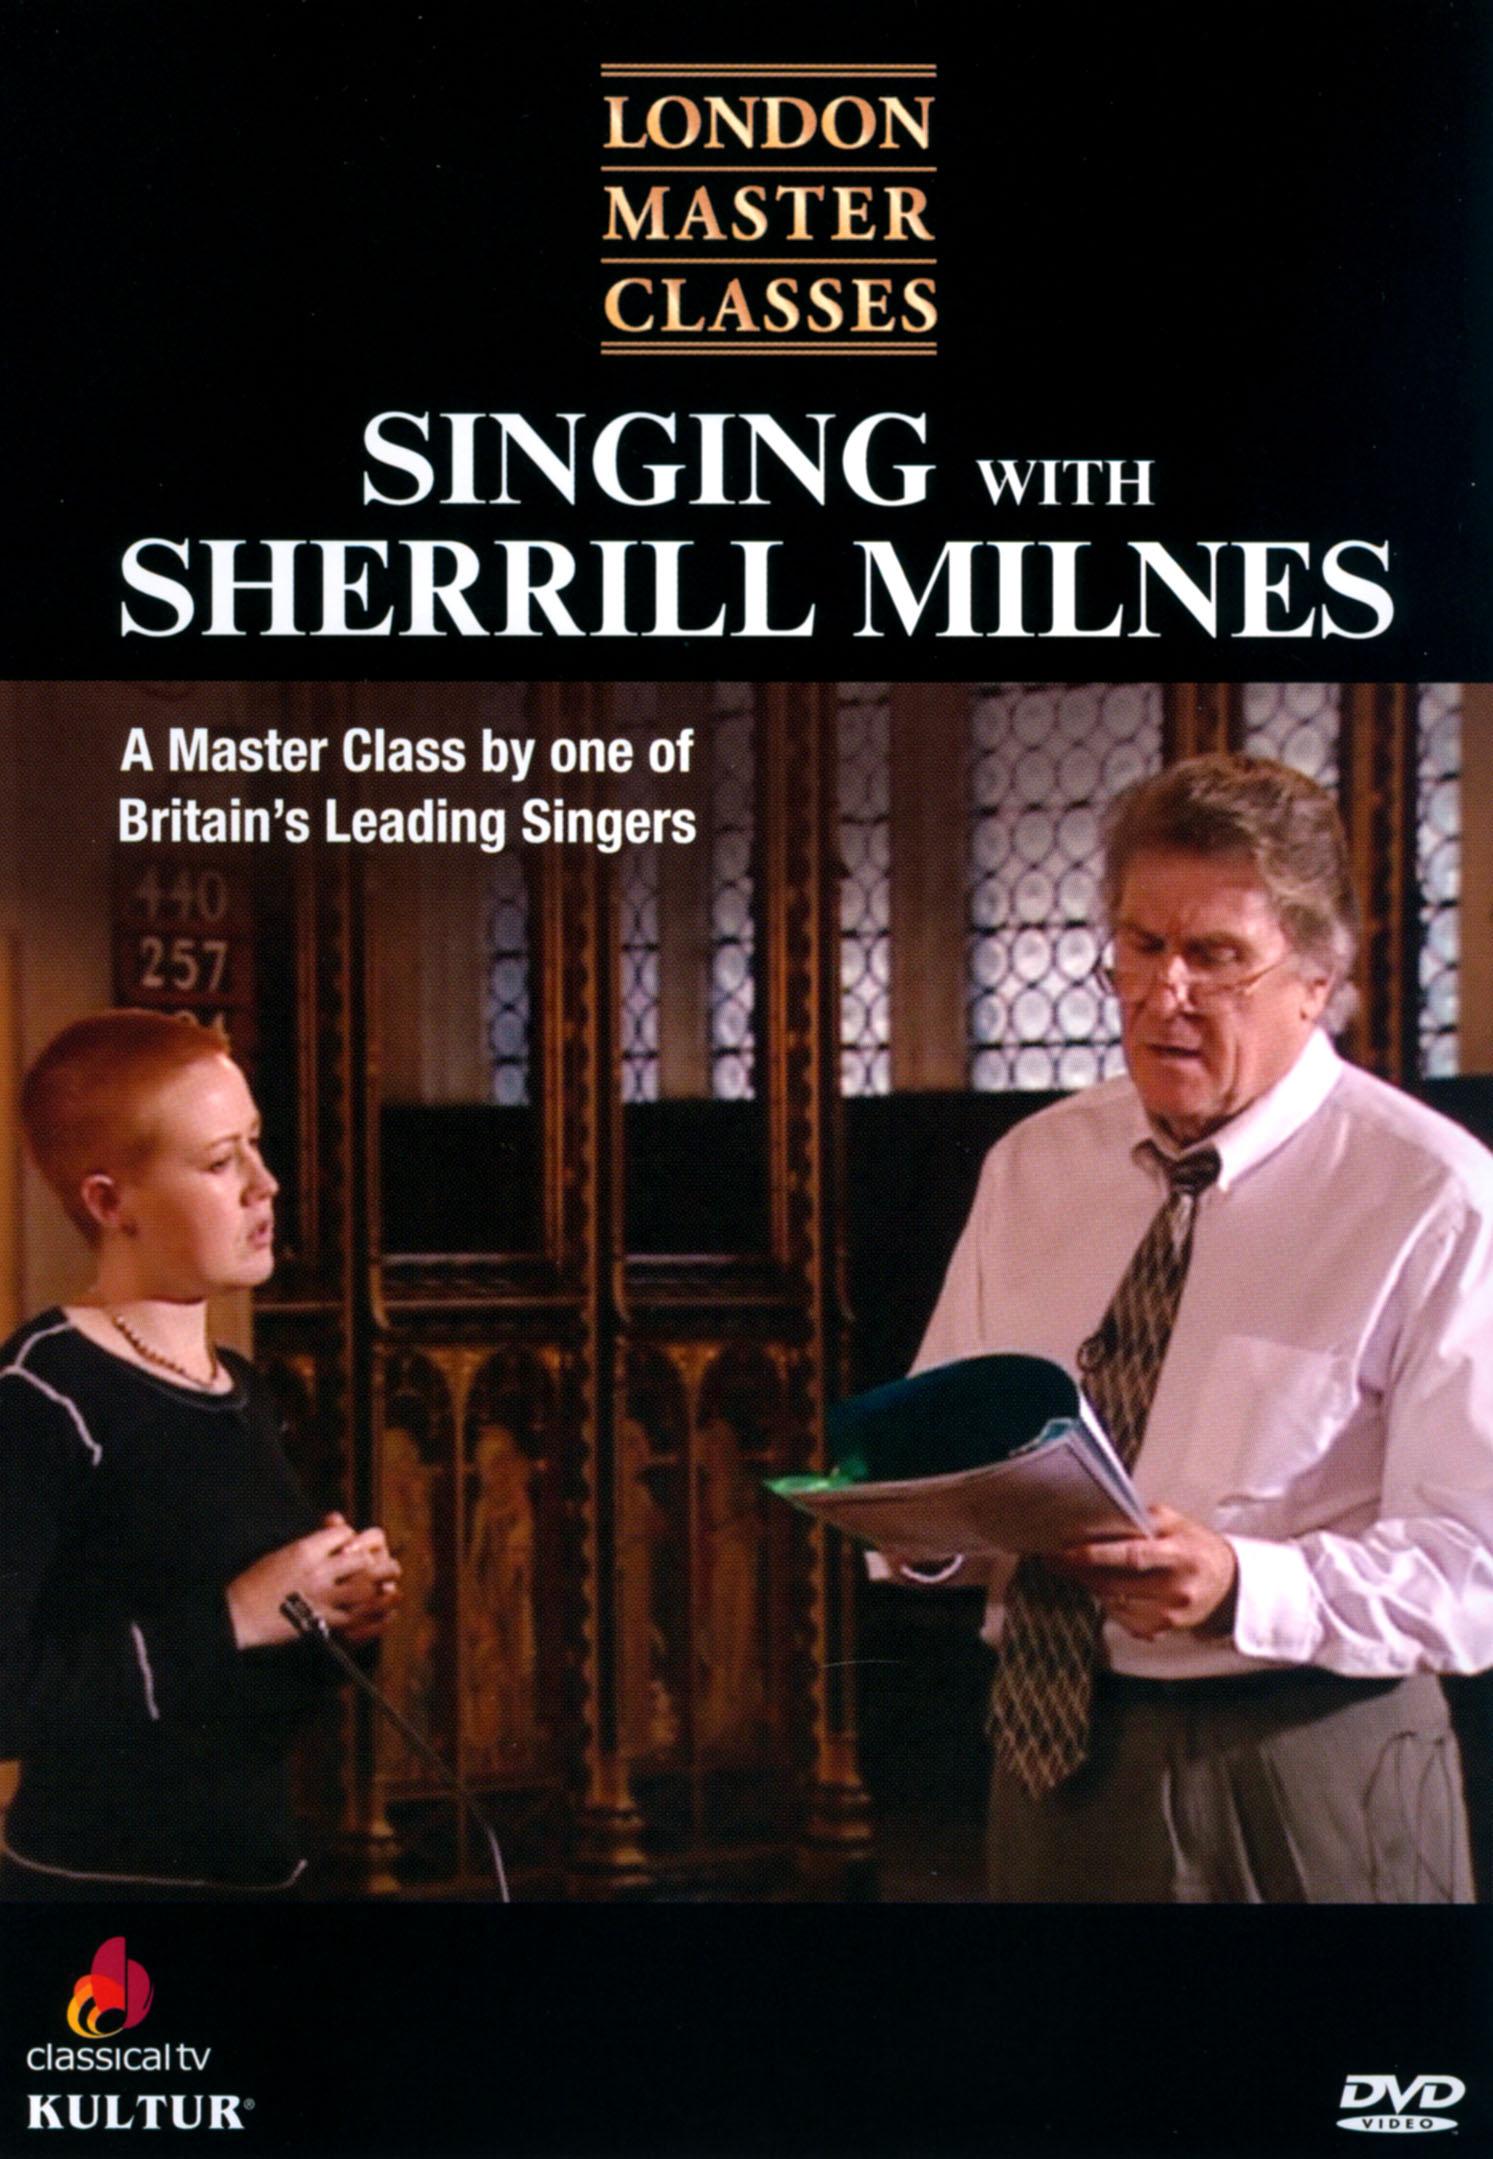 London Master Classes: Singing with Sherrill Milnes